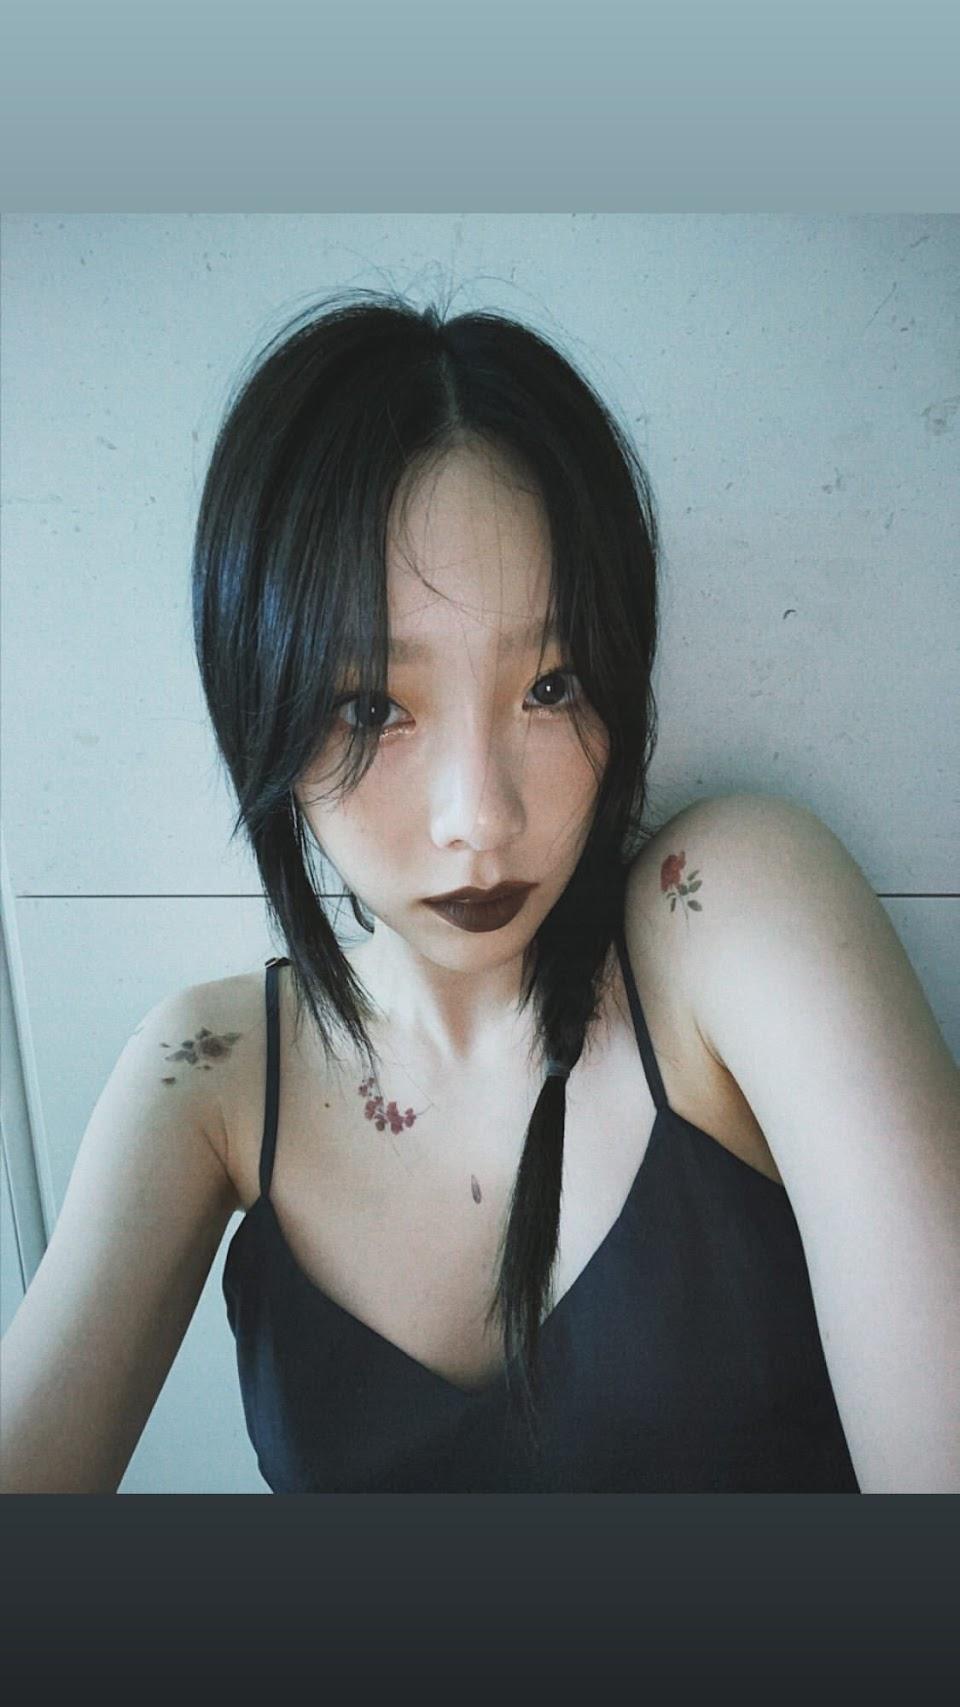 tae blacklips 2